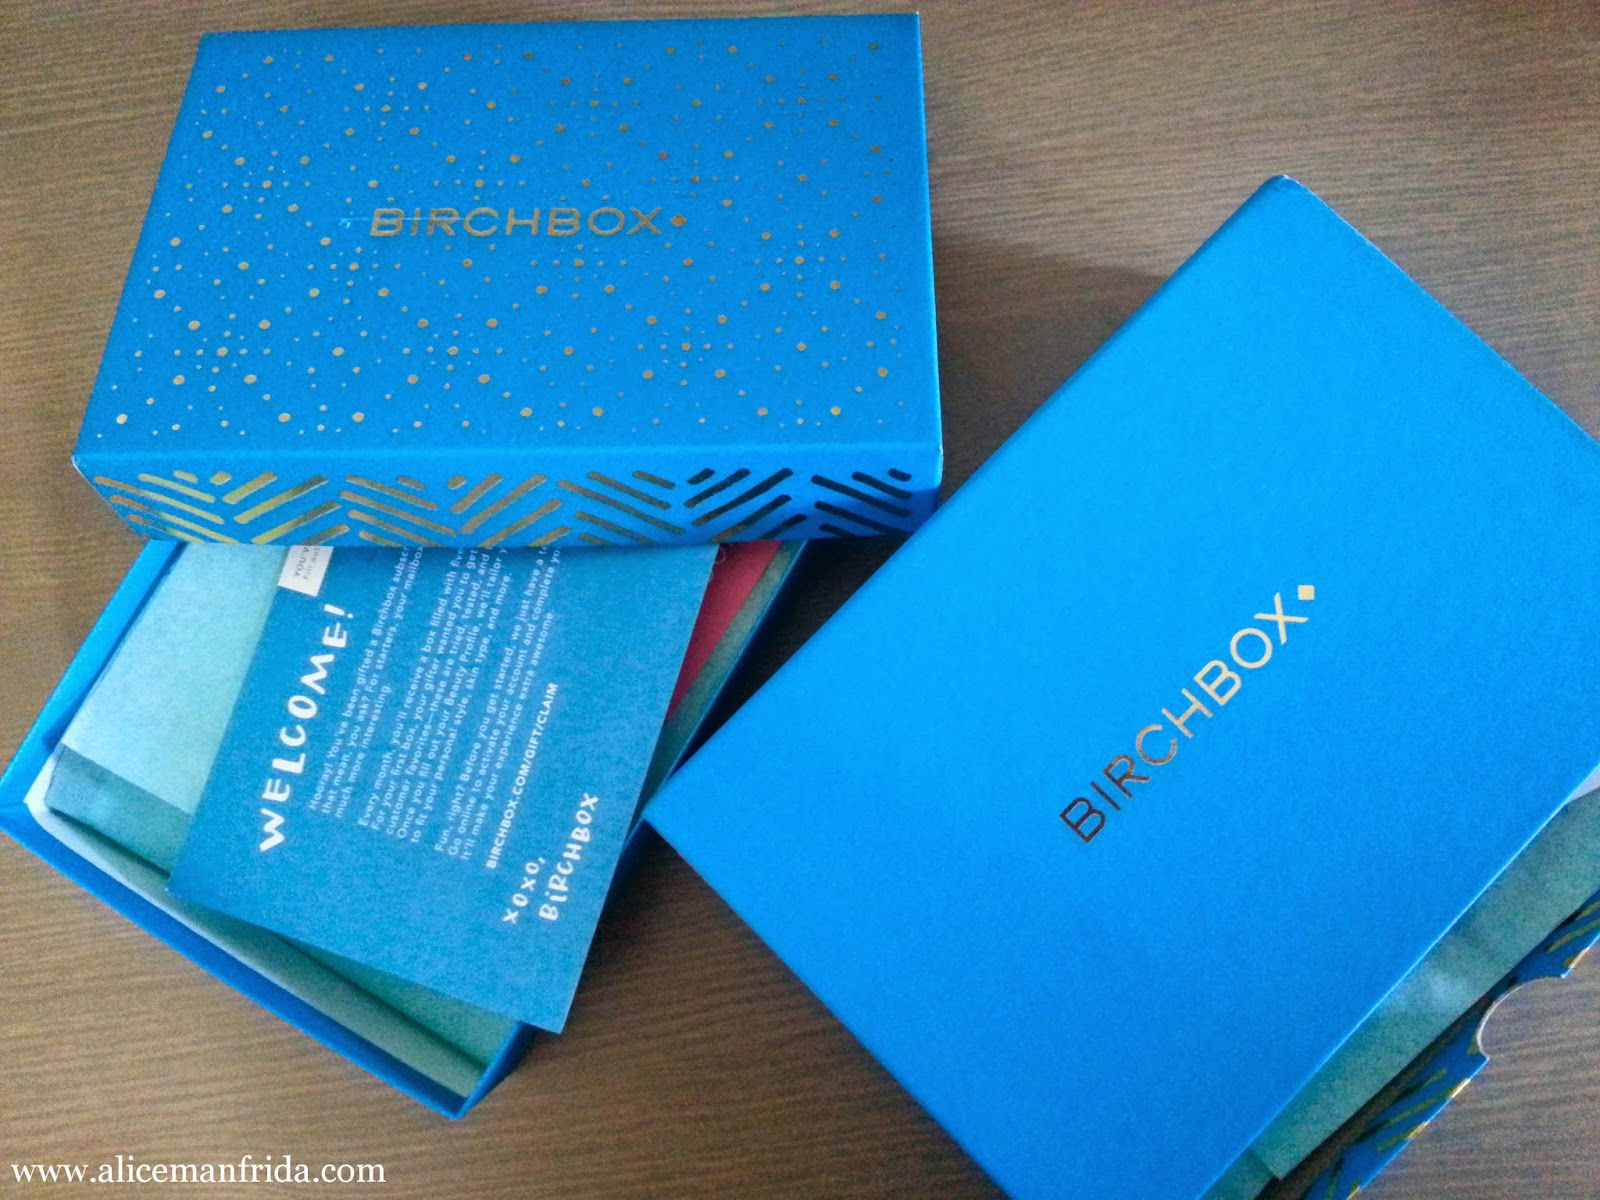 Birchbox, Men's Box, Women's Box, Beauty Subscription Box